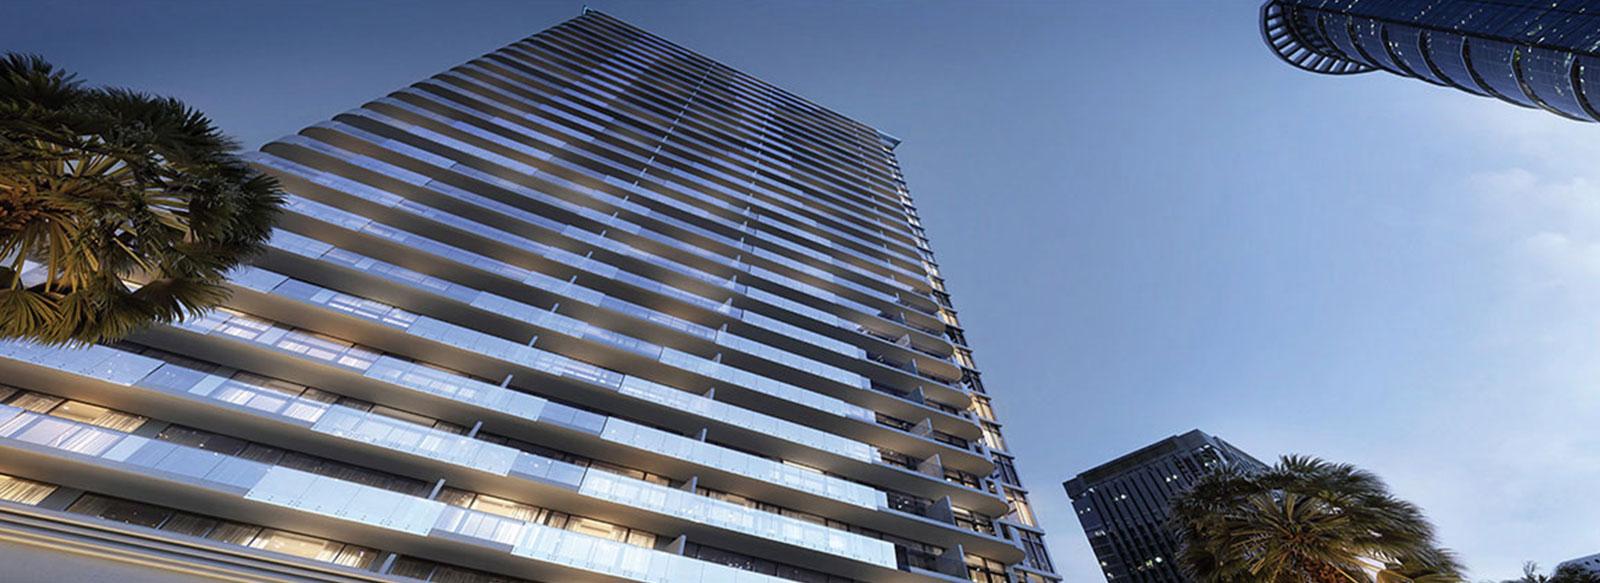 Merano Tower Offers